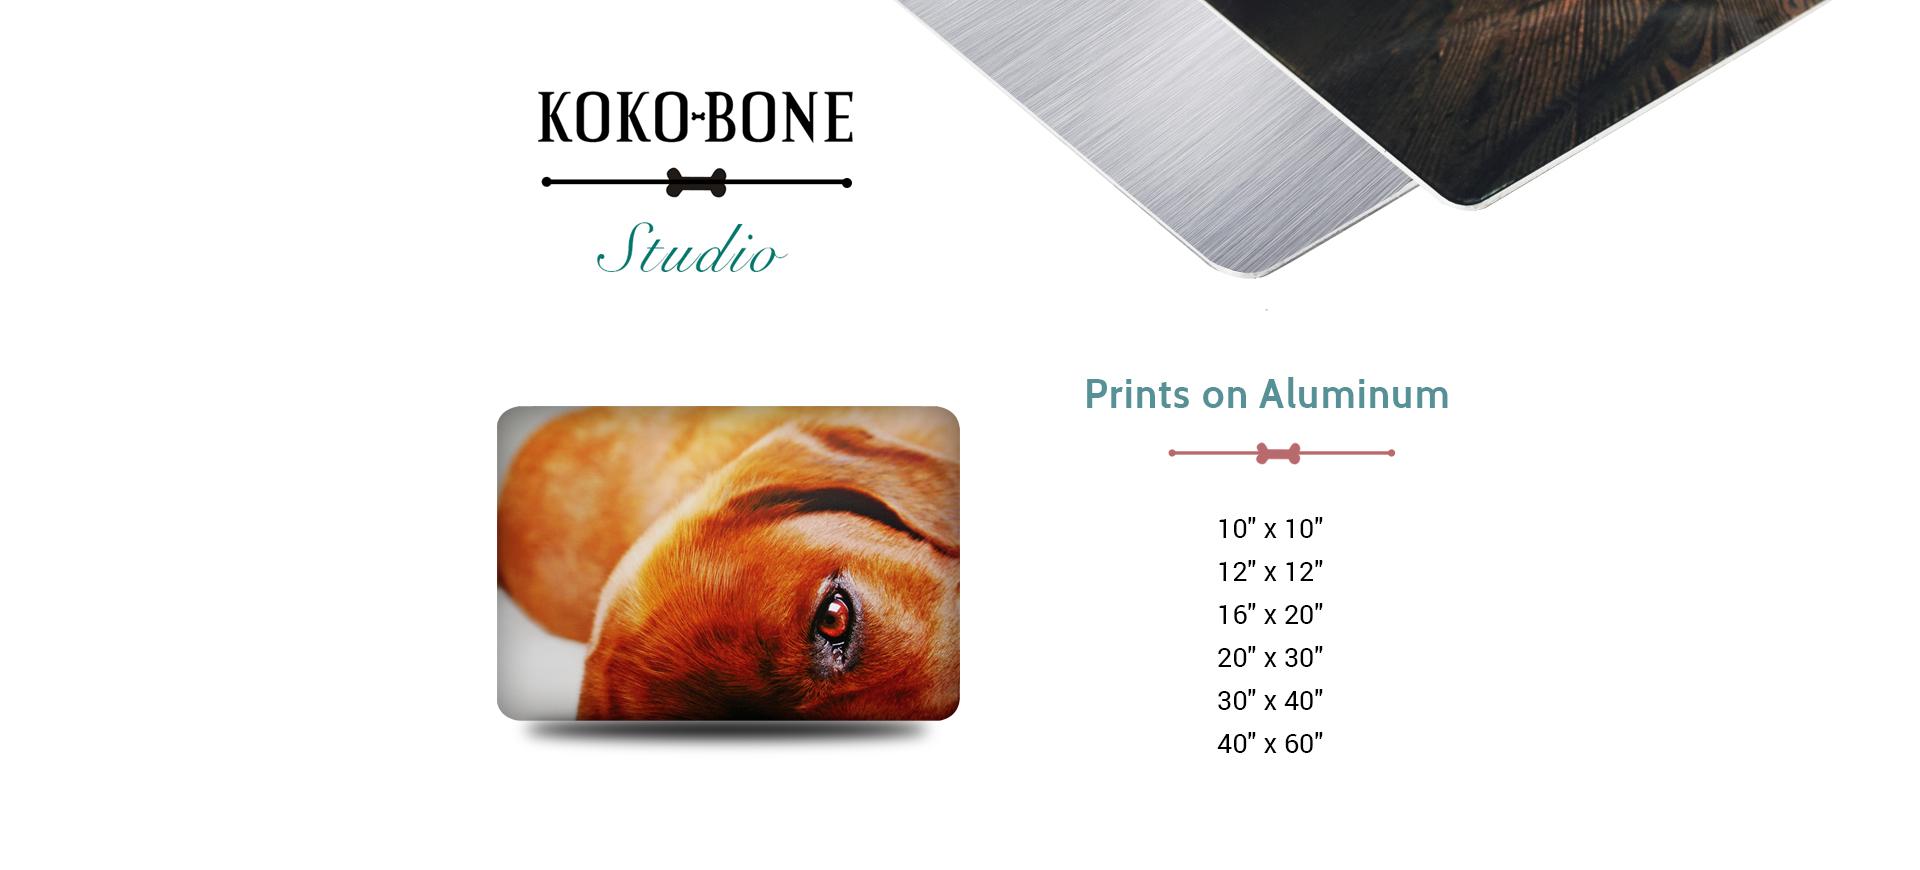 kokobone_aluminumprinting_slider1